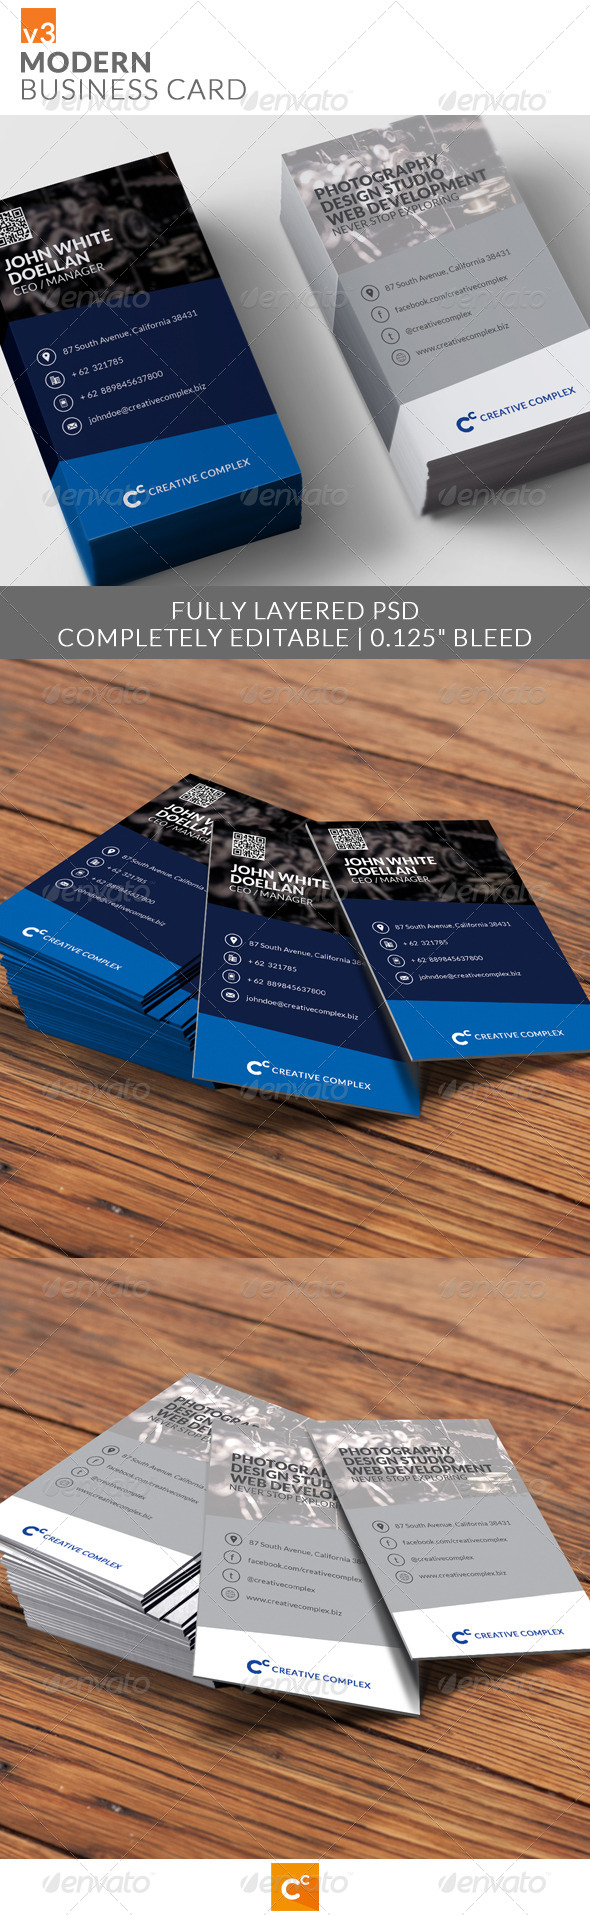 GraphicRiver Modern Business Card v3 8207885